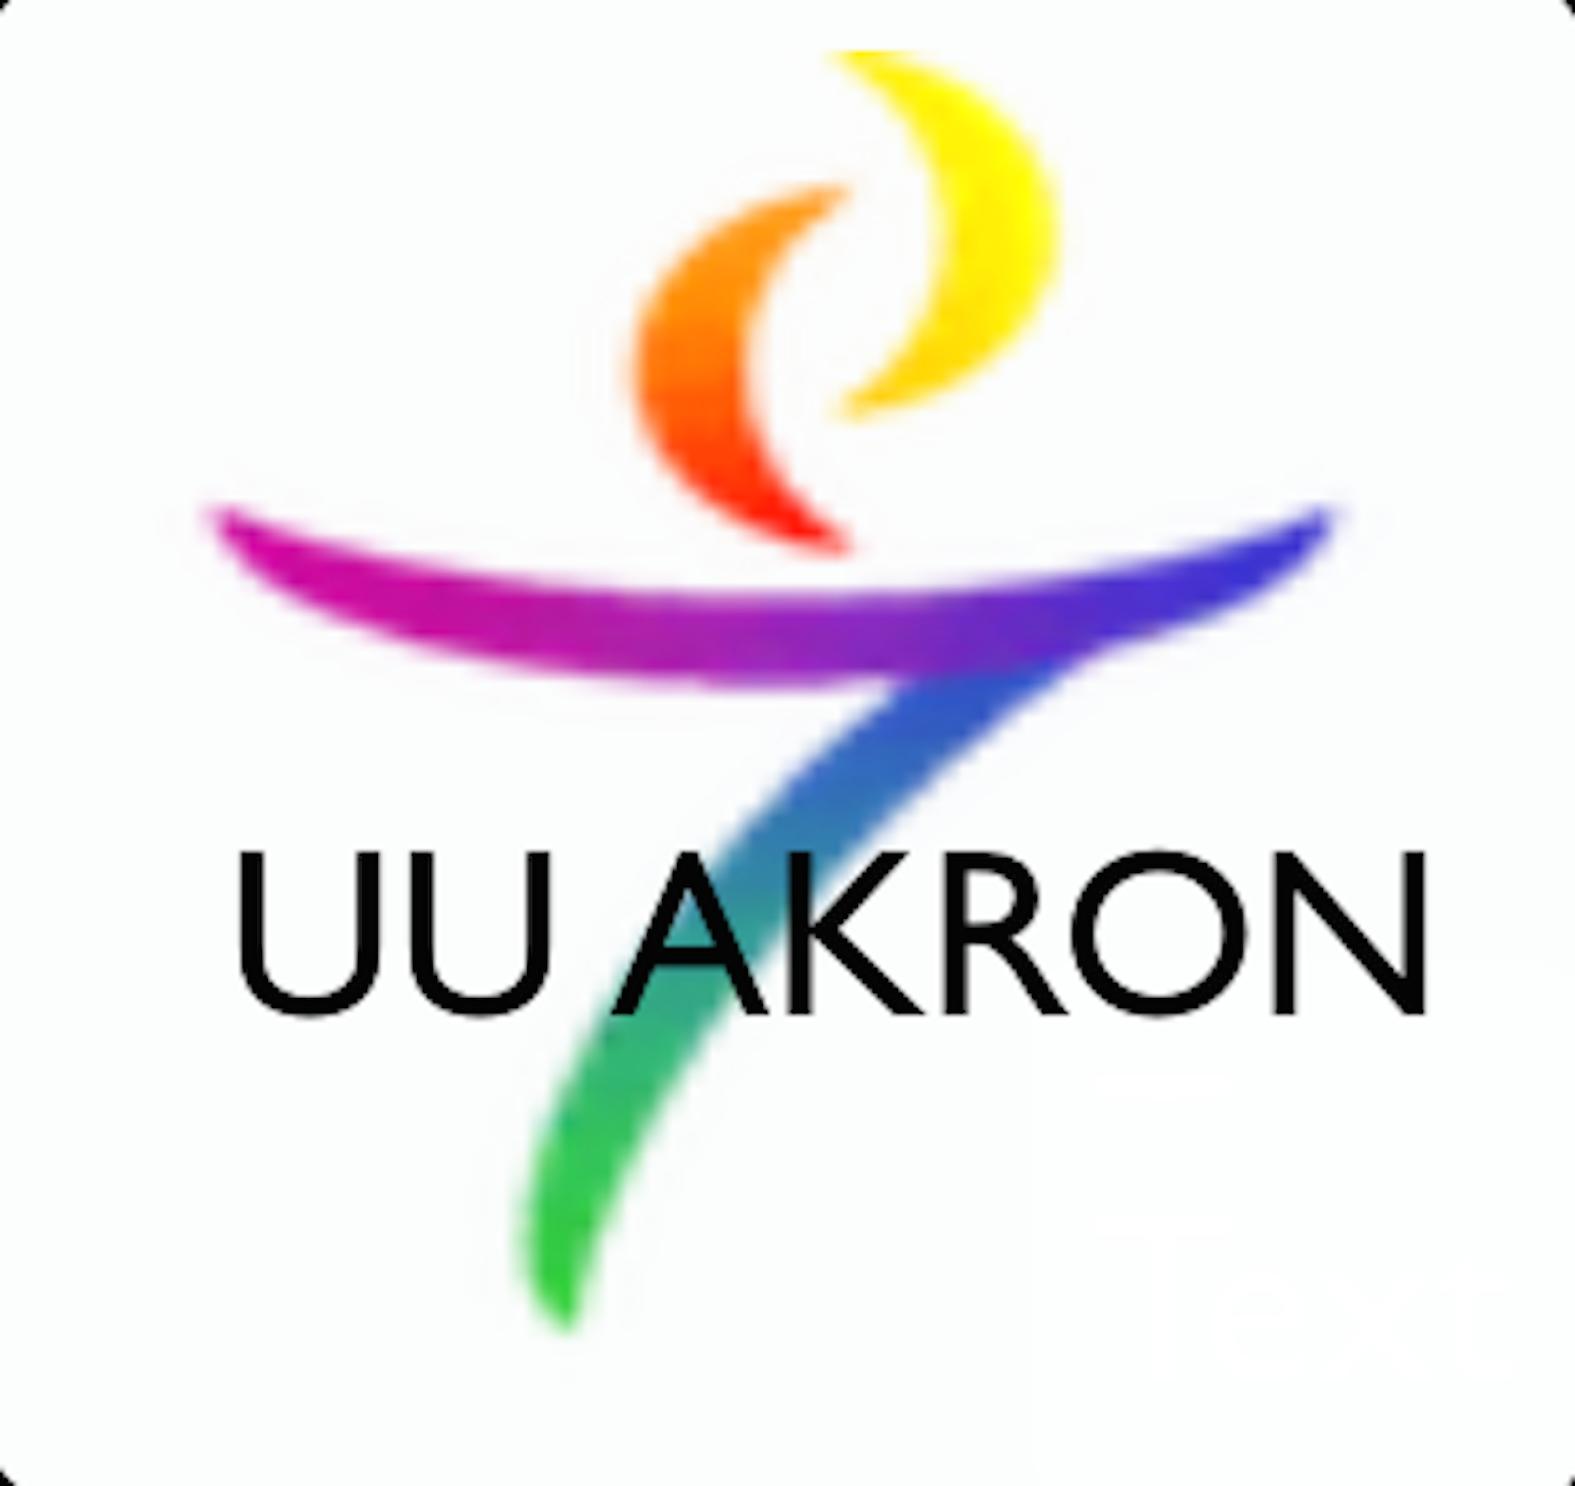 UUAkron Servicecast